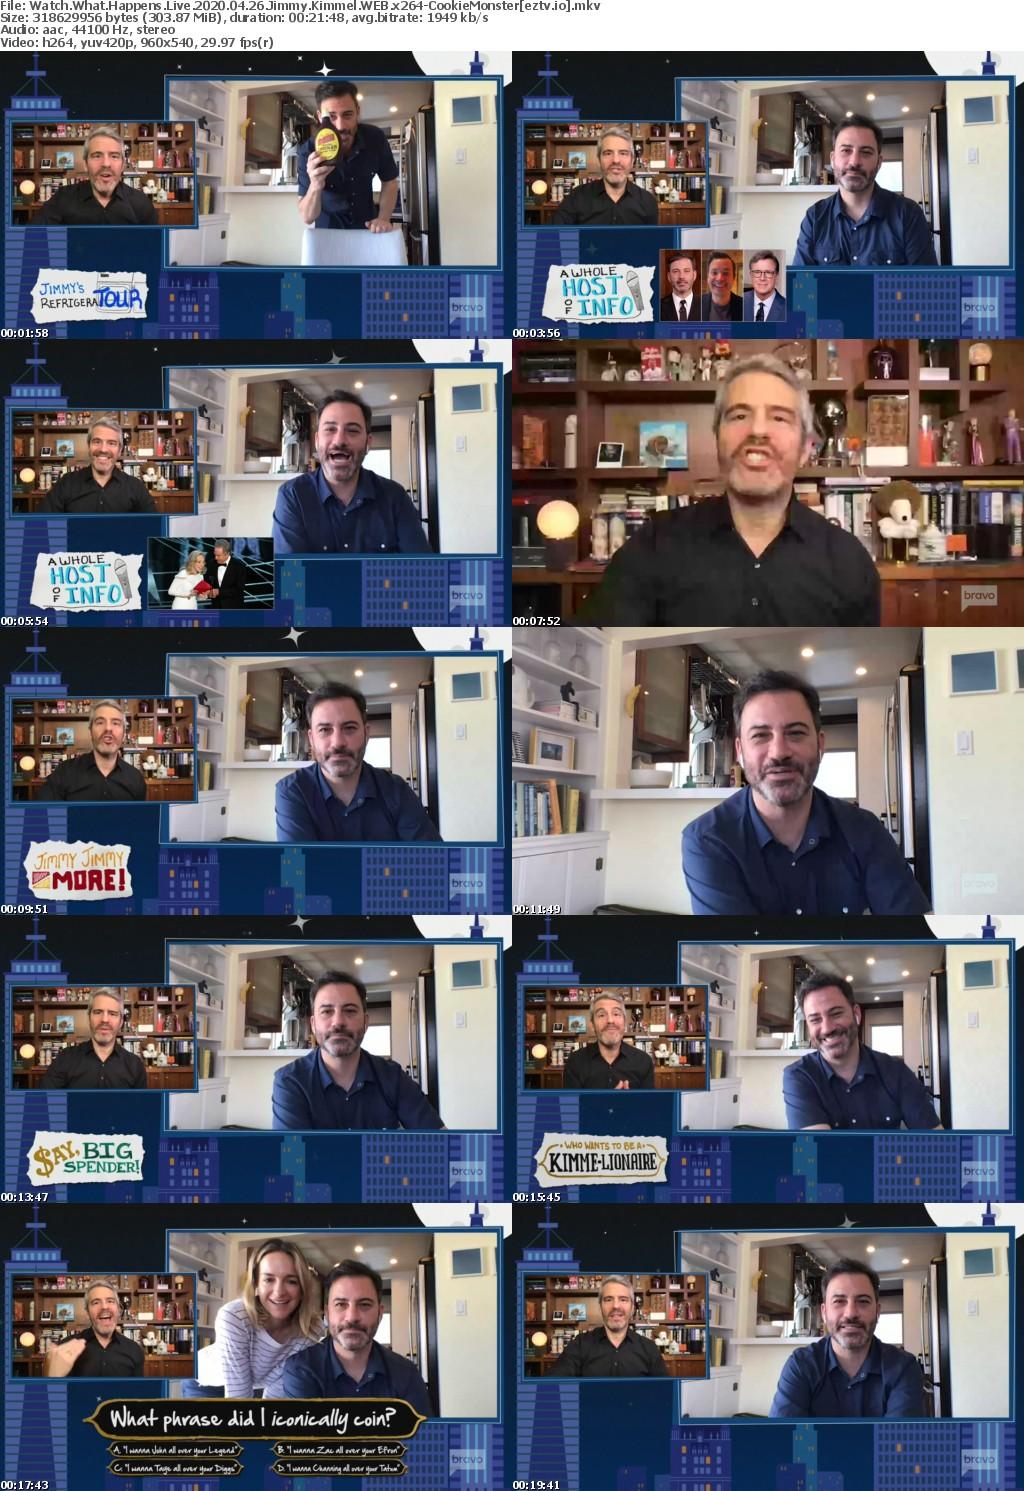 Watch What Happens Live 2020 04 26 Jimmy Kimmel WEB x264-CookieMonster